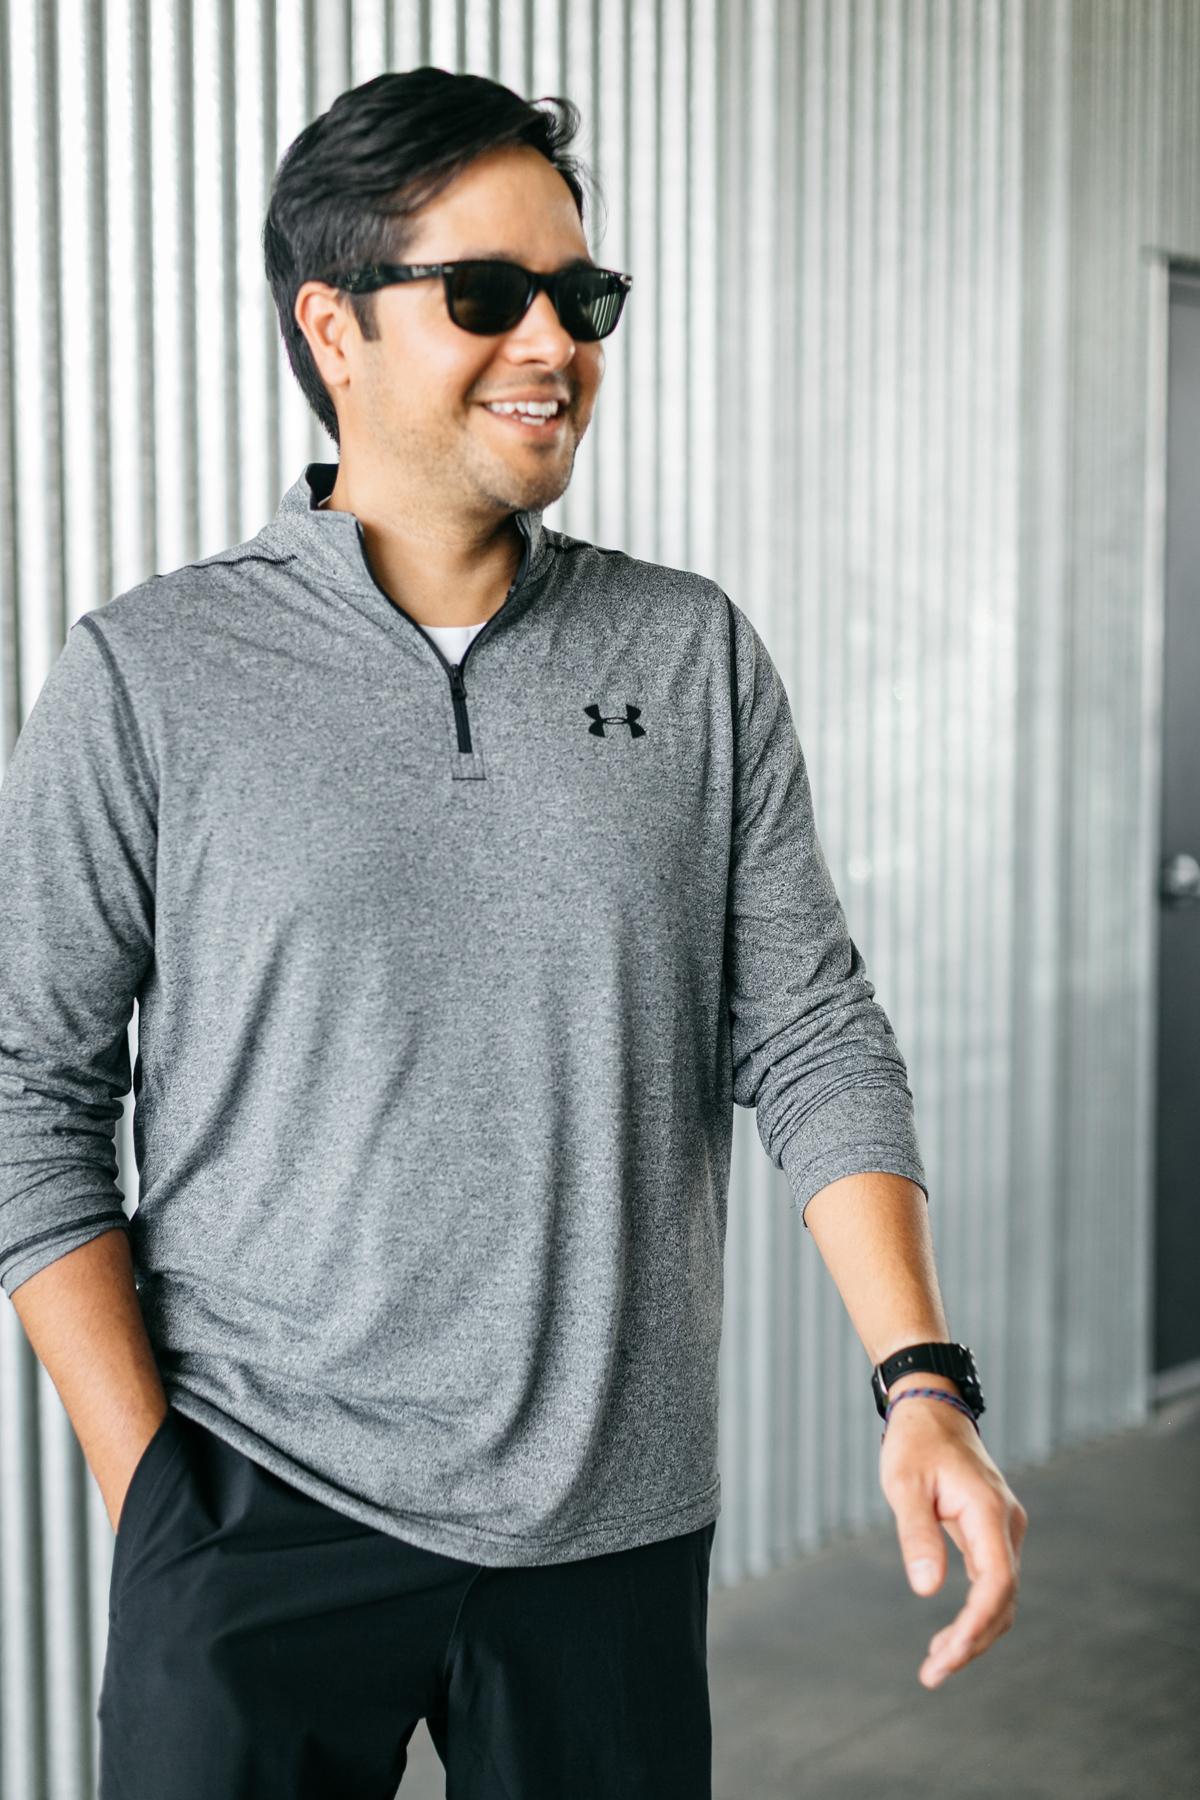 Nordstrom Men's Active, Under Armour, Nike